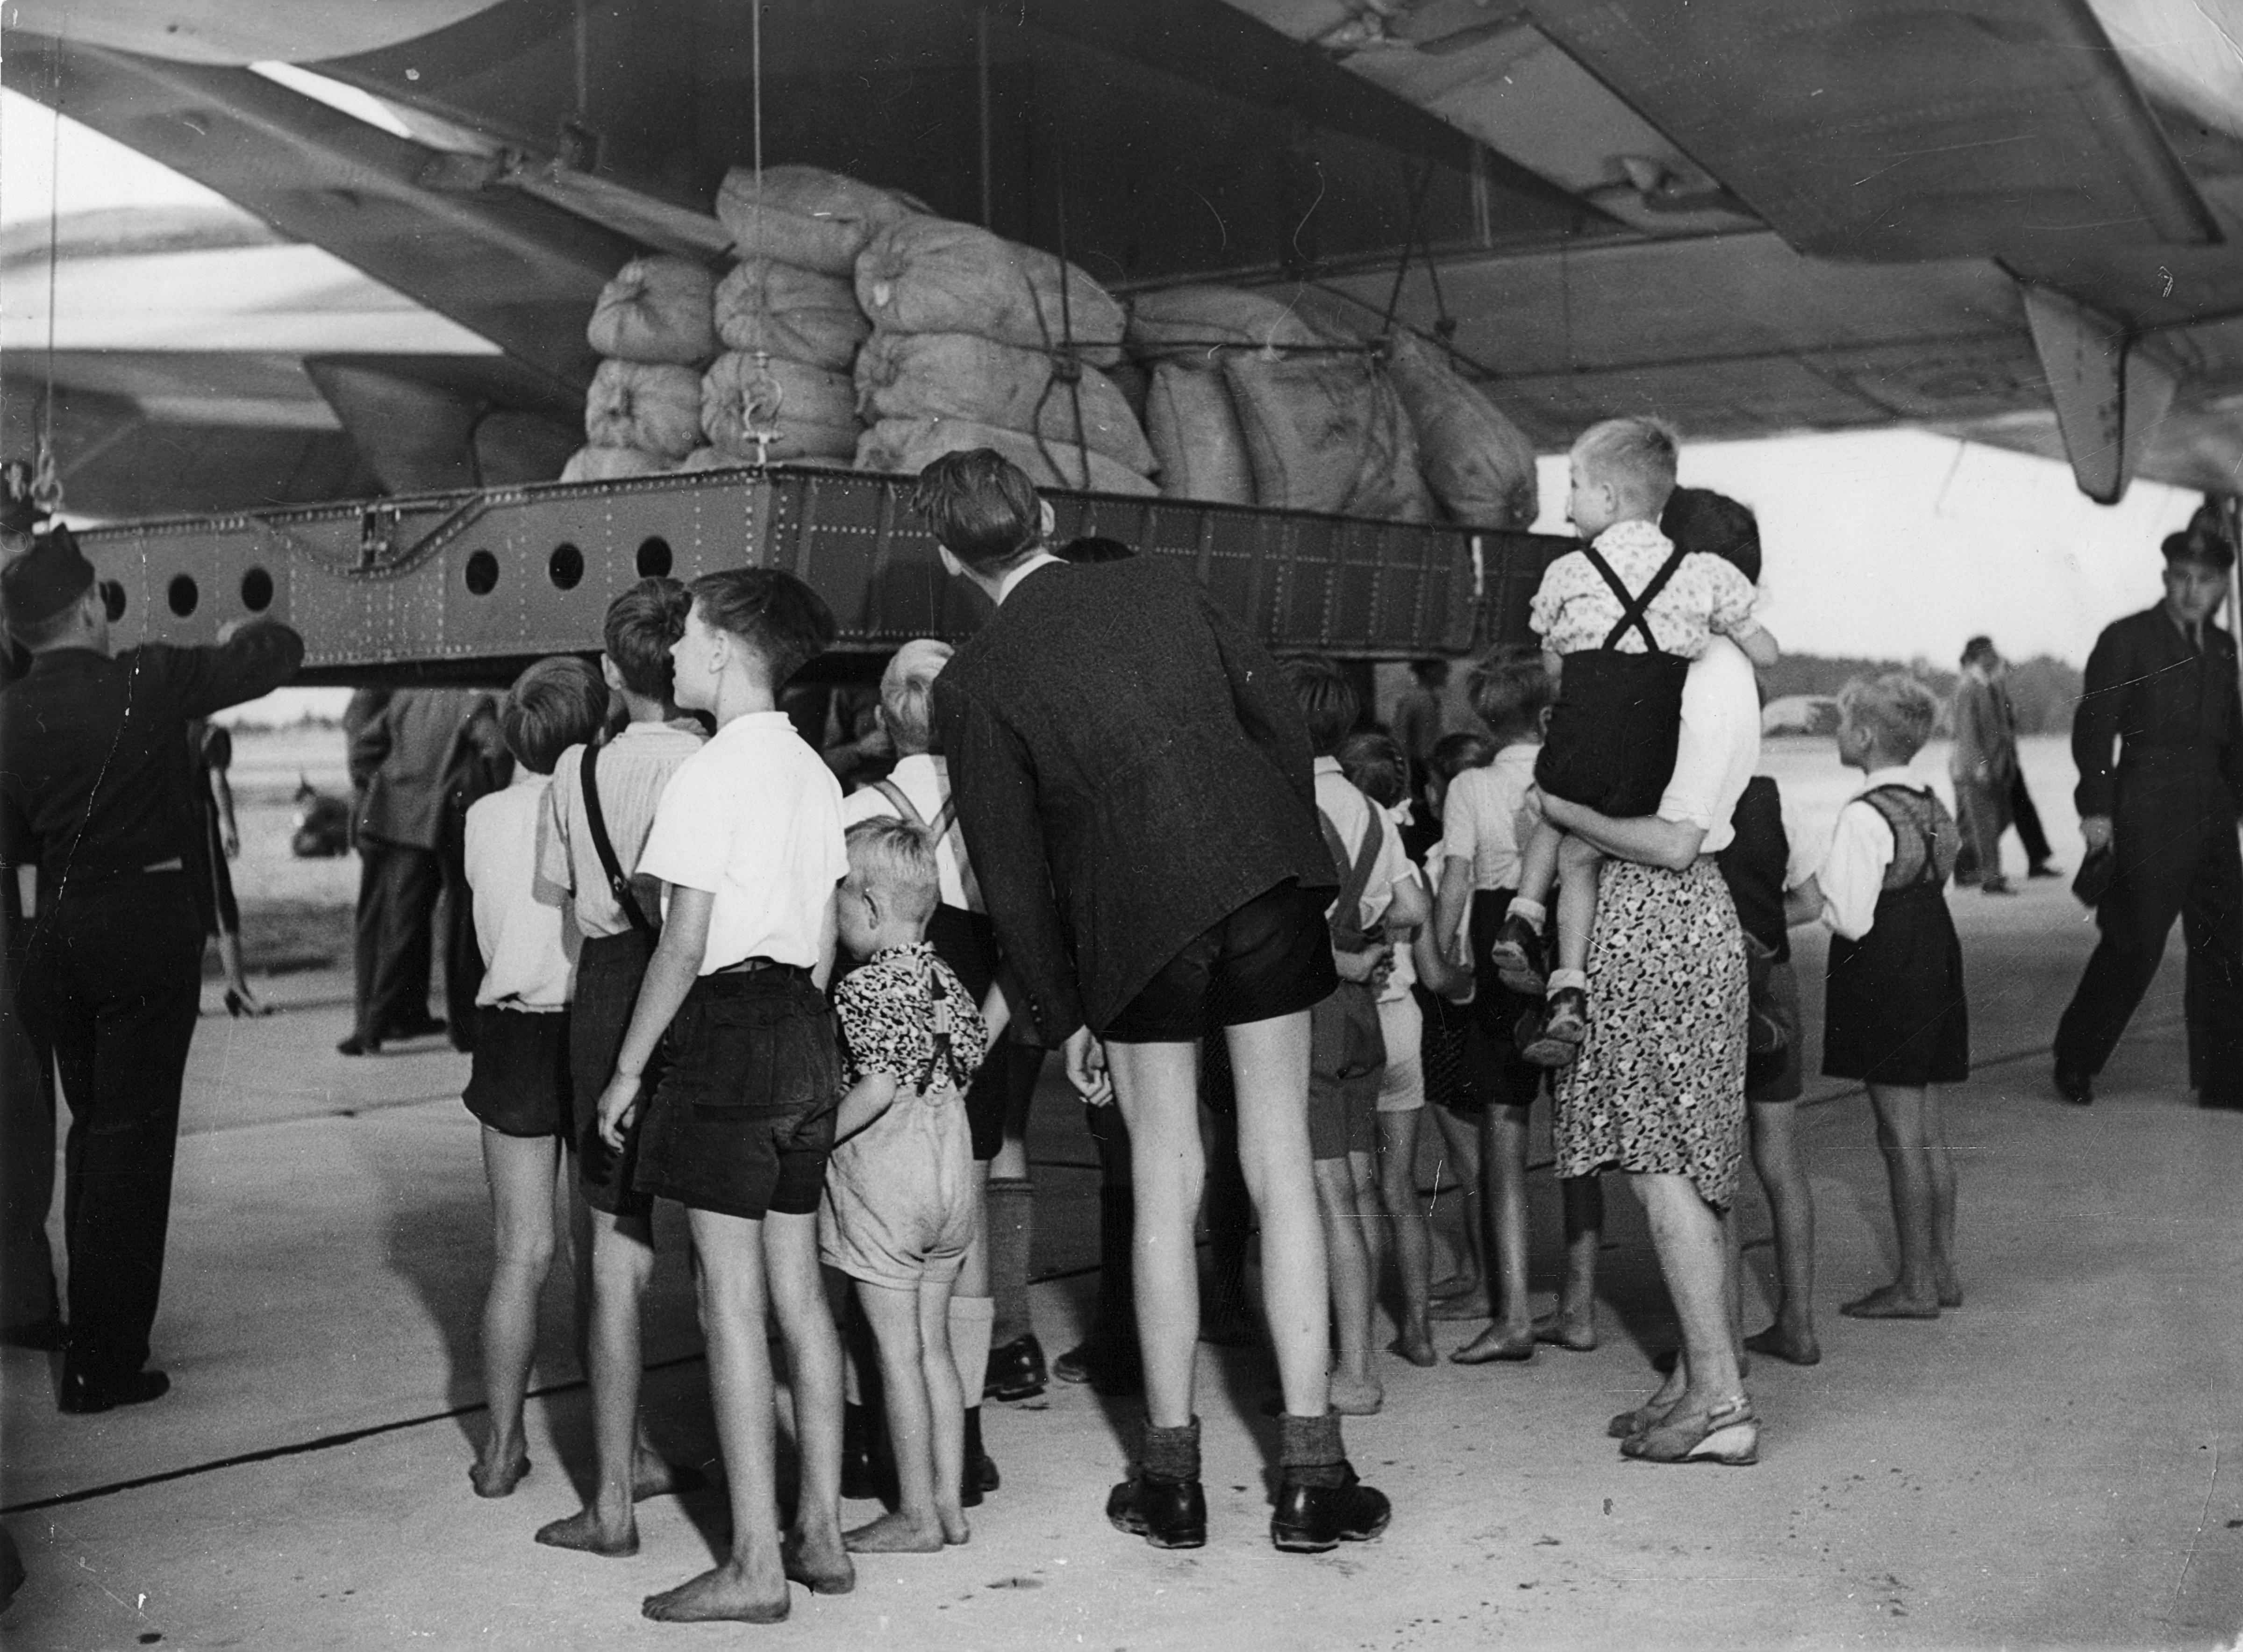 C-74_Globemaster_unloading_flour_at_Berlin_Gatow_during_Operation_Vittles.jpg